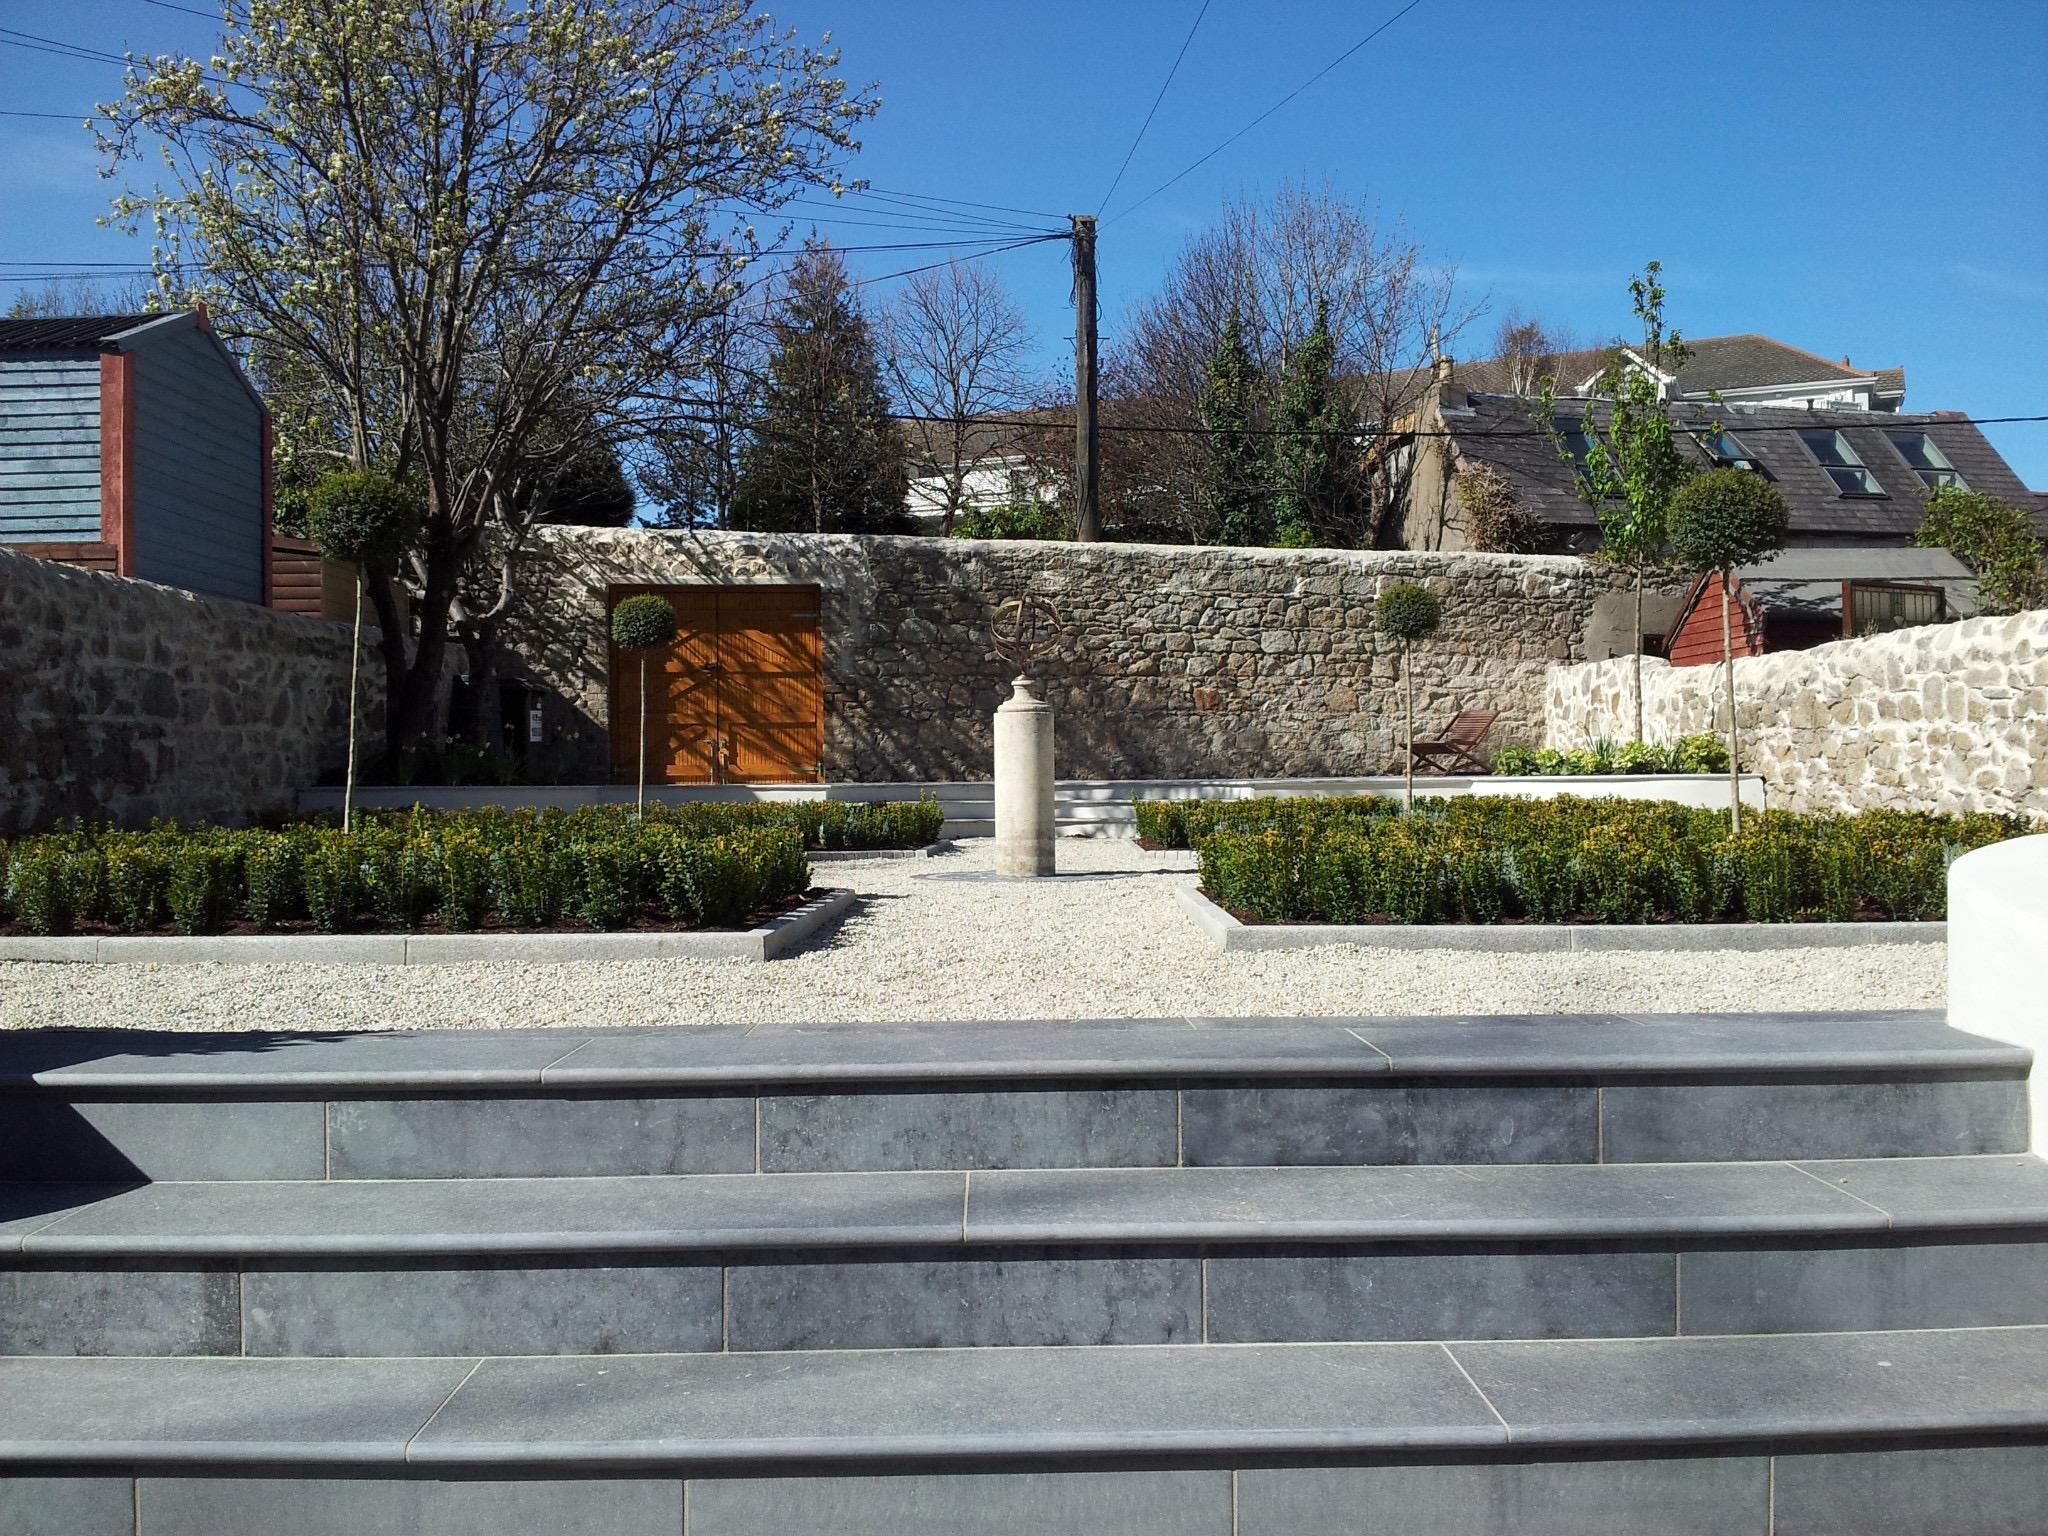 Garden steps to mid terrace